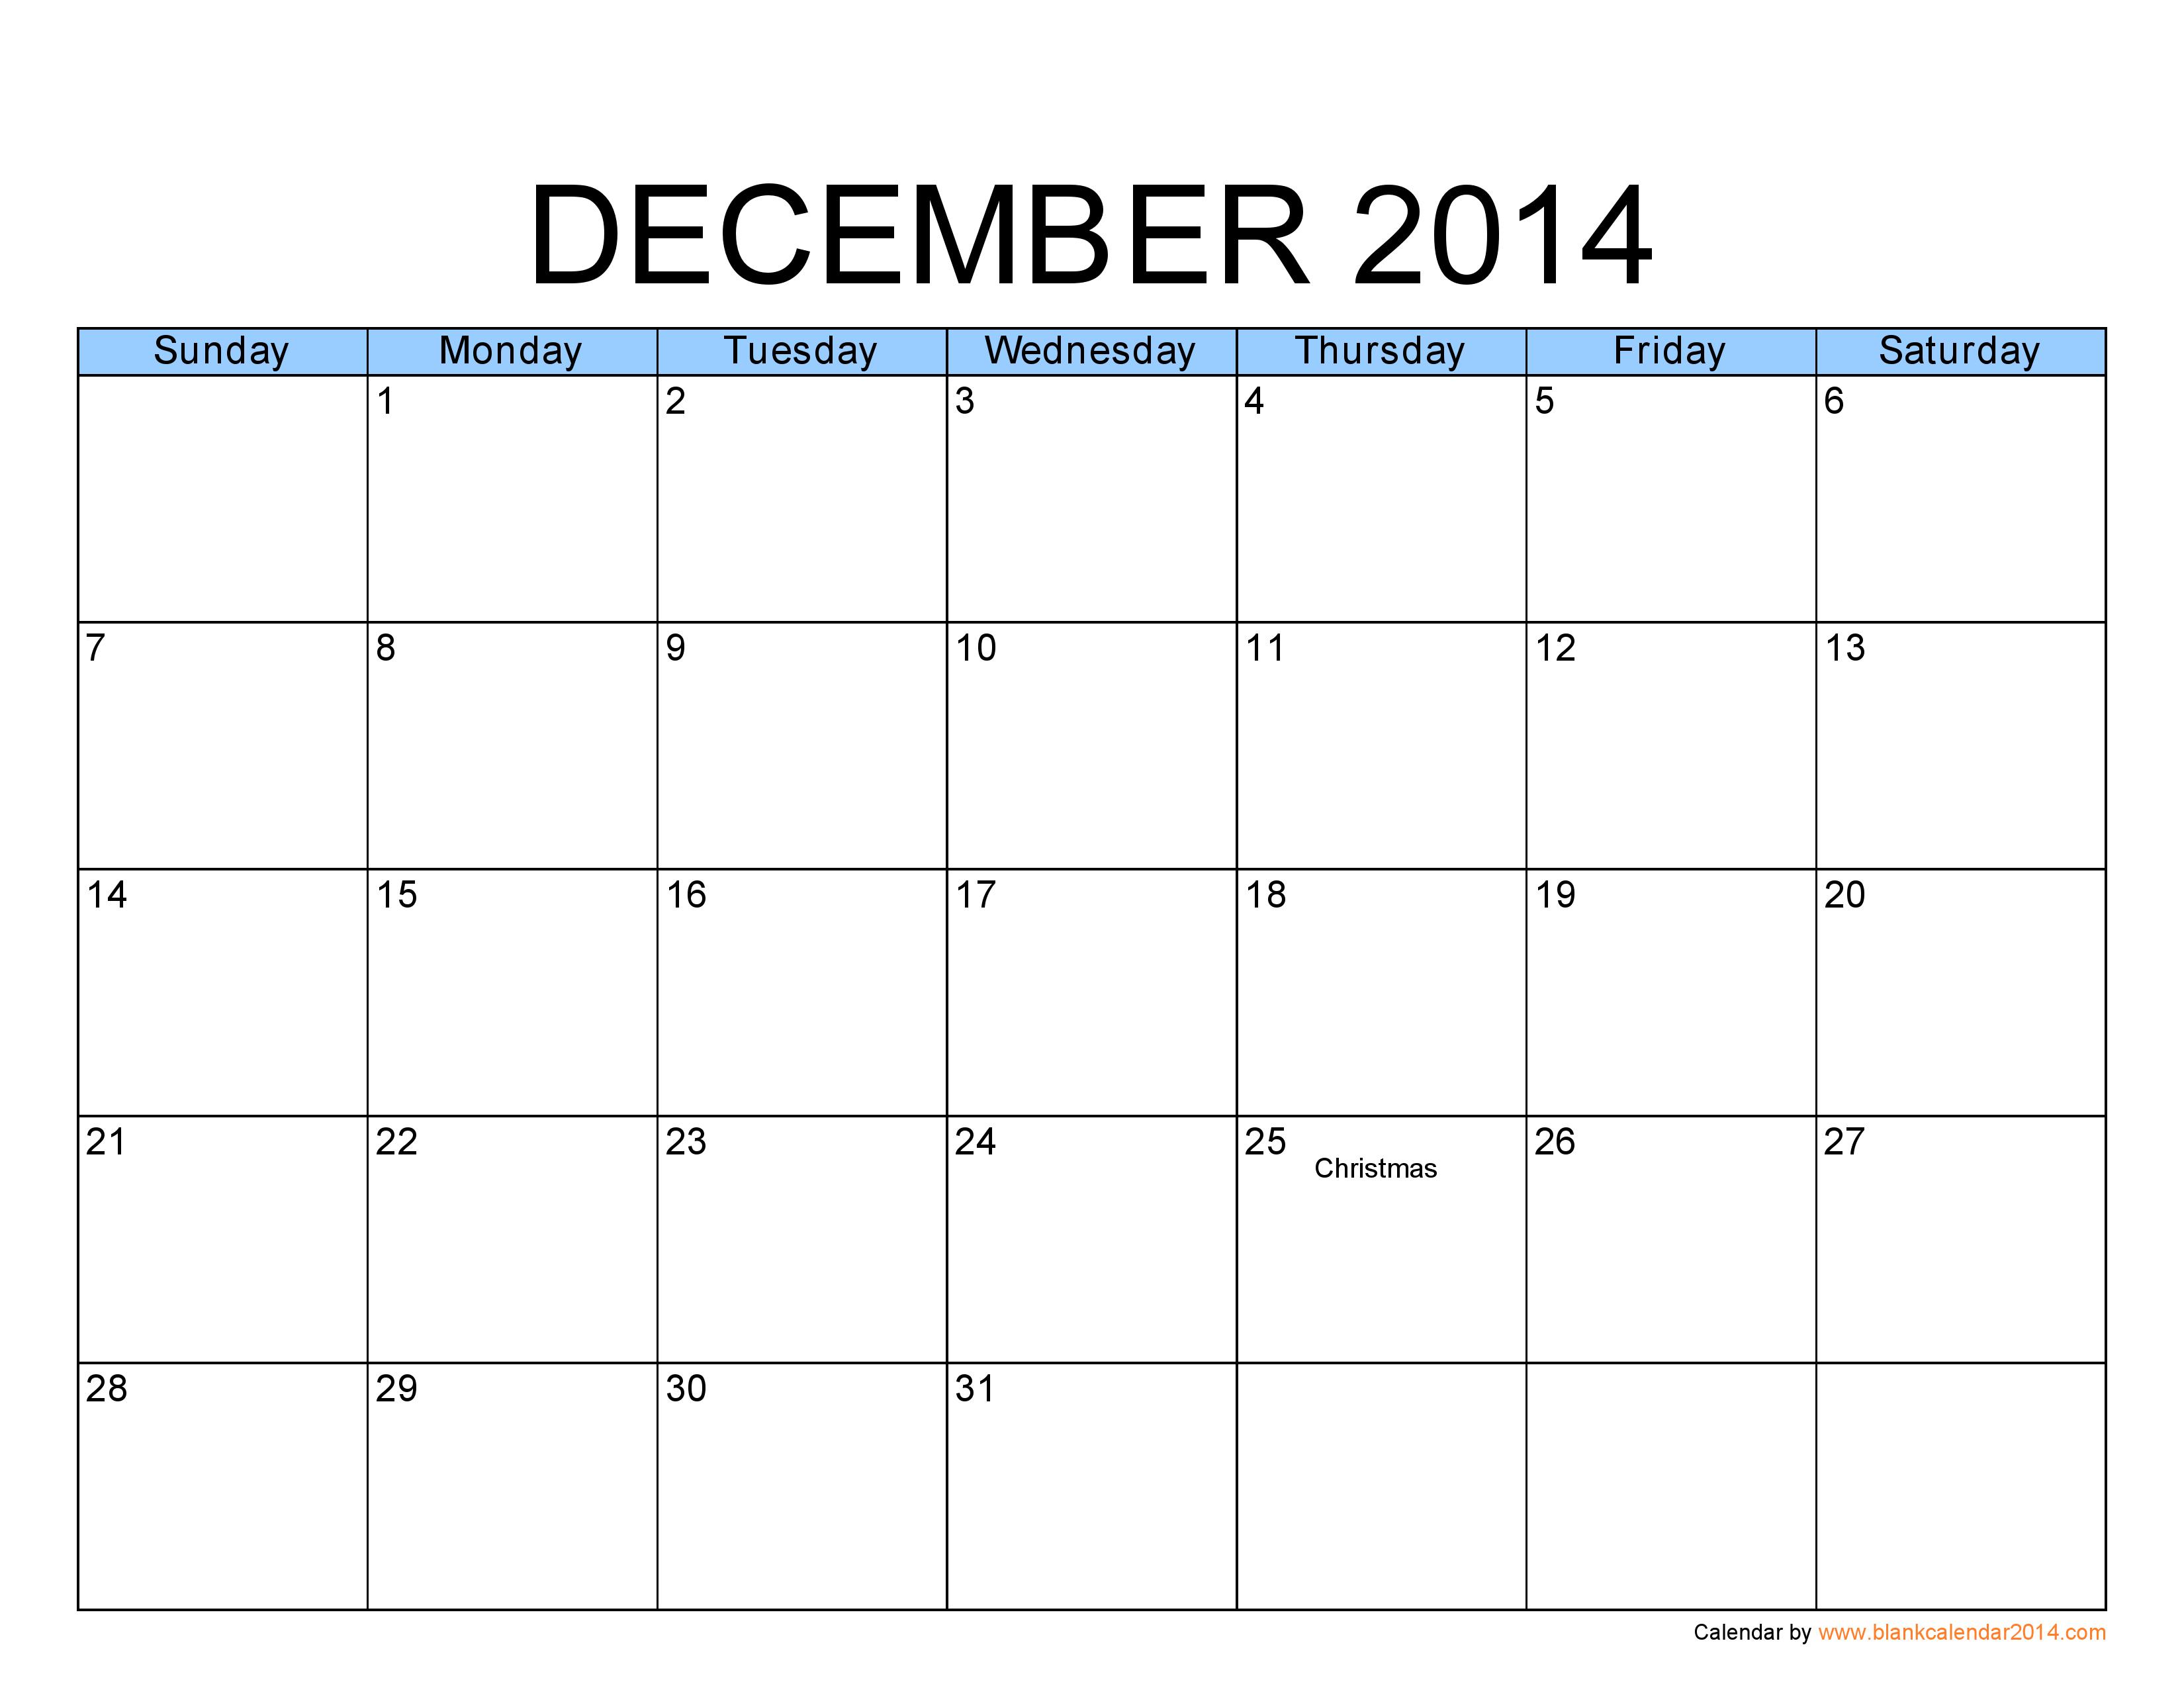 Blank December Calendar | December 2014 Calendar Template Free Printable Calendar Large Blocks